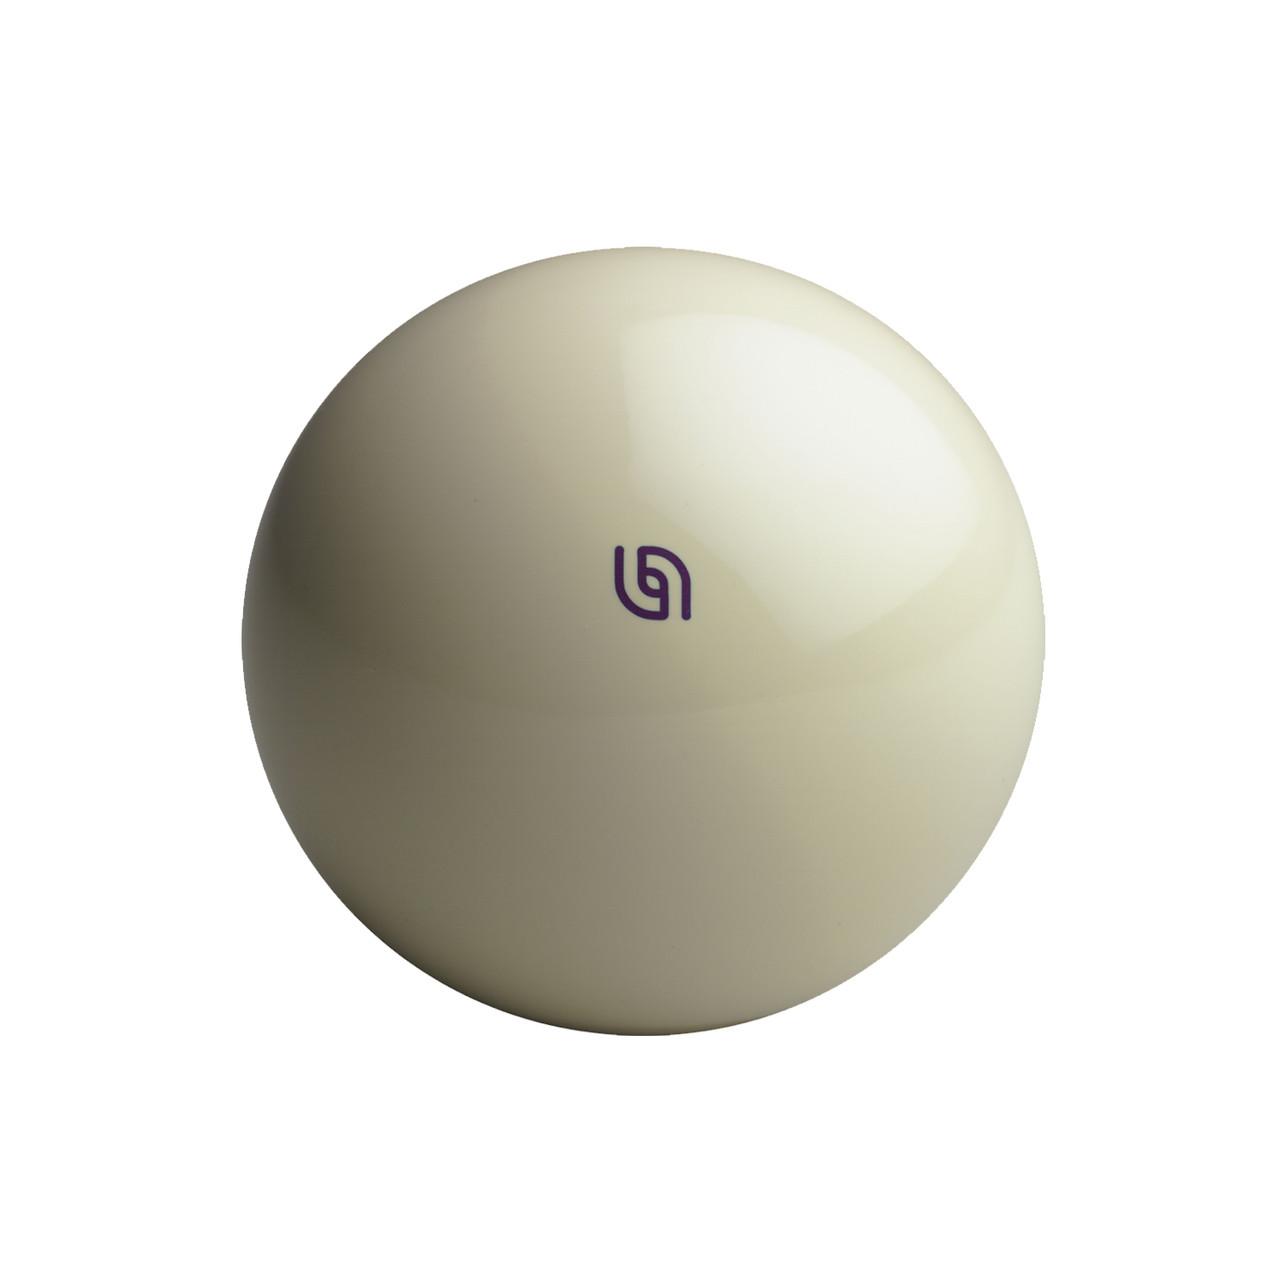 Aramith Duramith Magnetic Cue Ball - Purple Logo